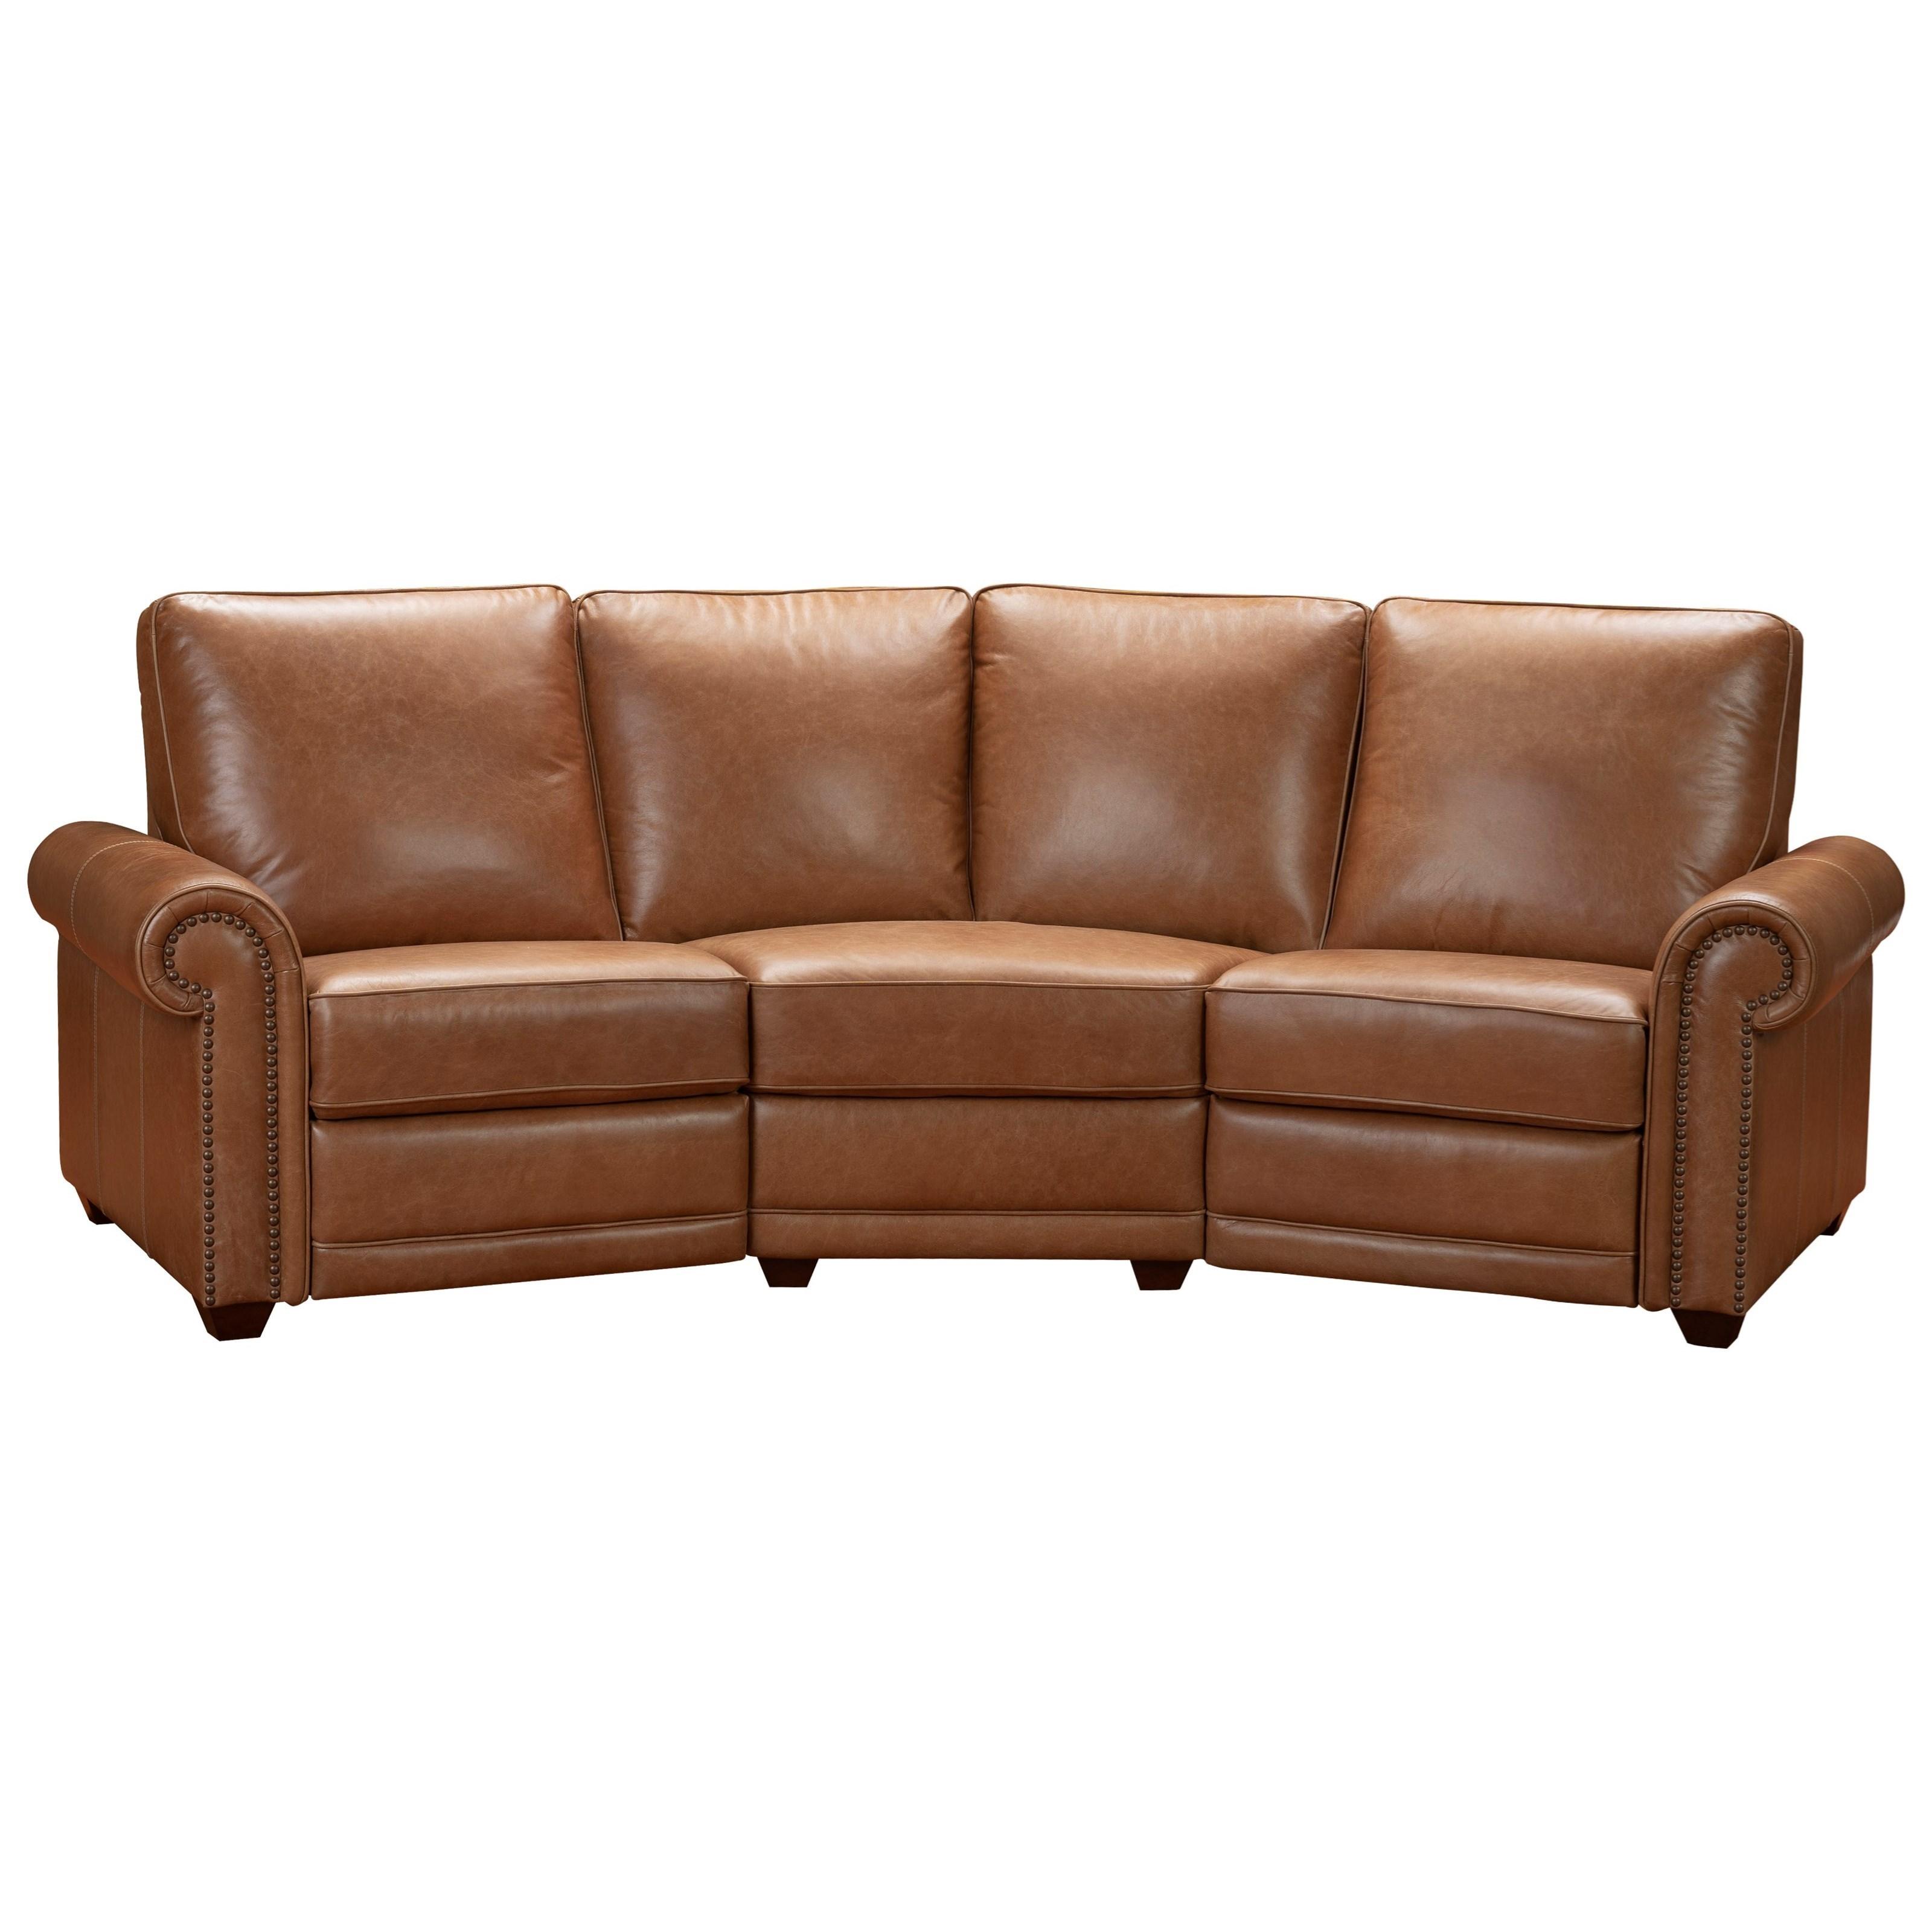 3-Piece Sectional Conversation Sofa